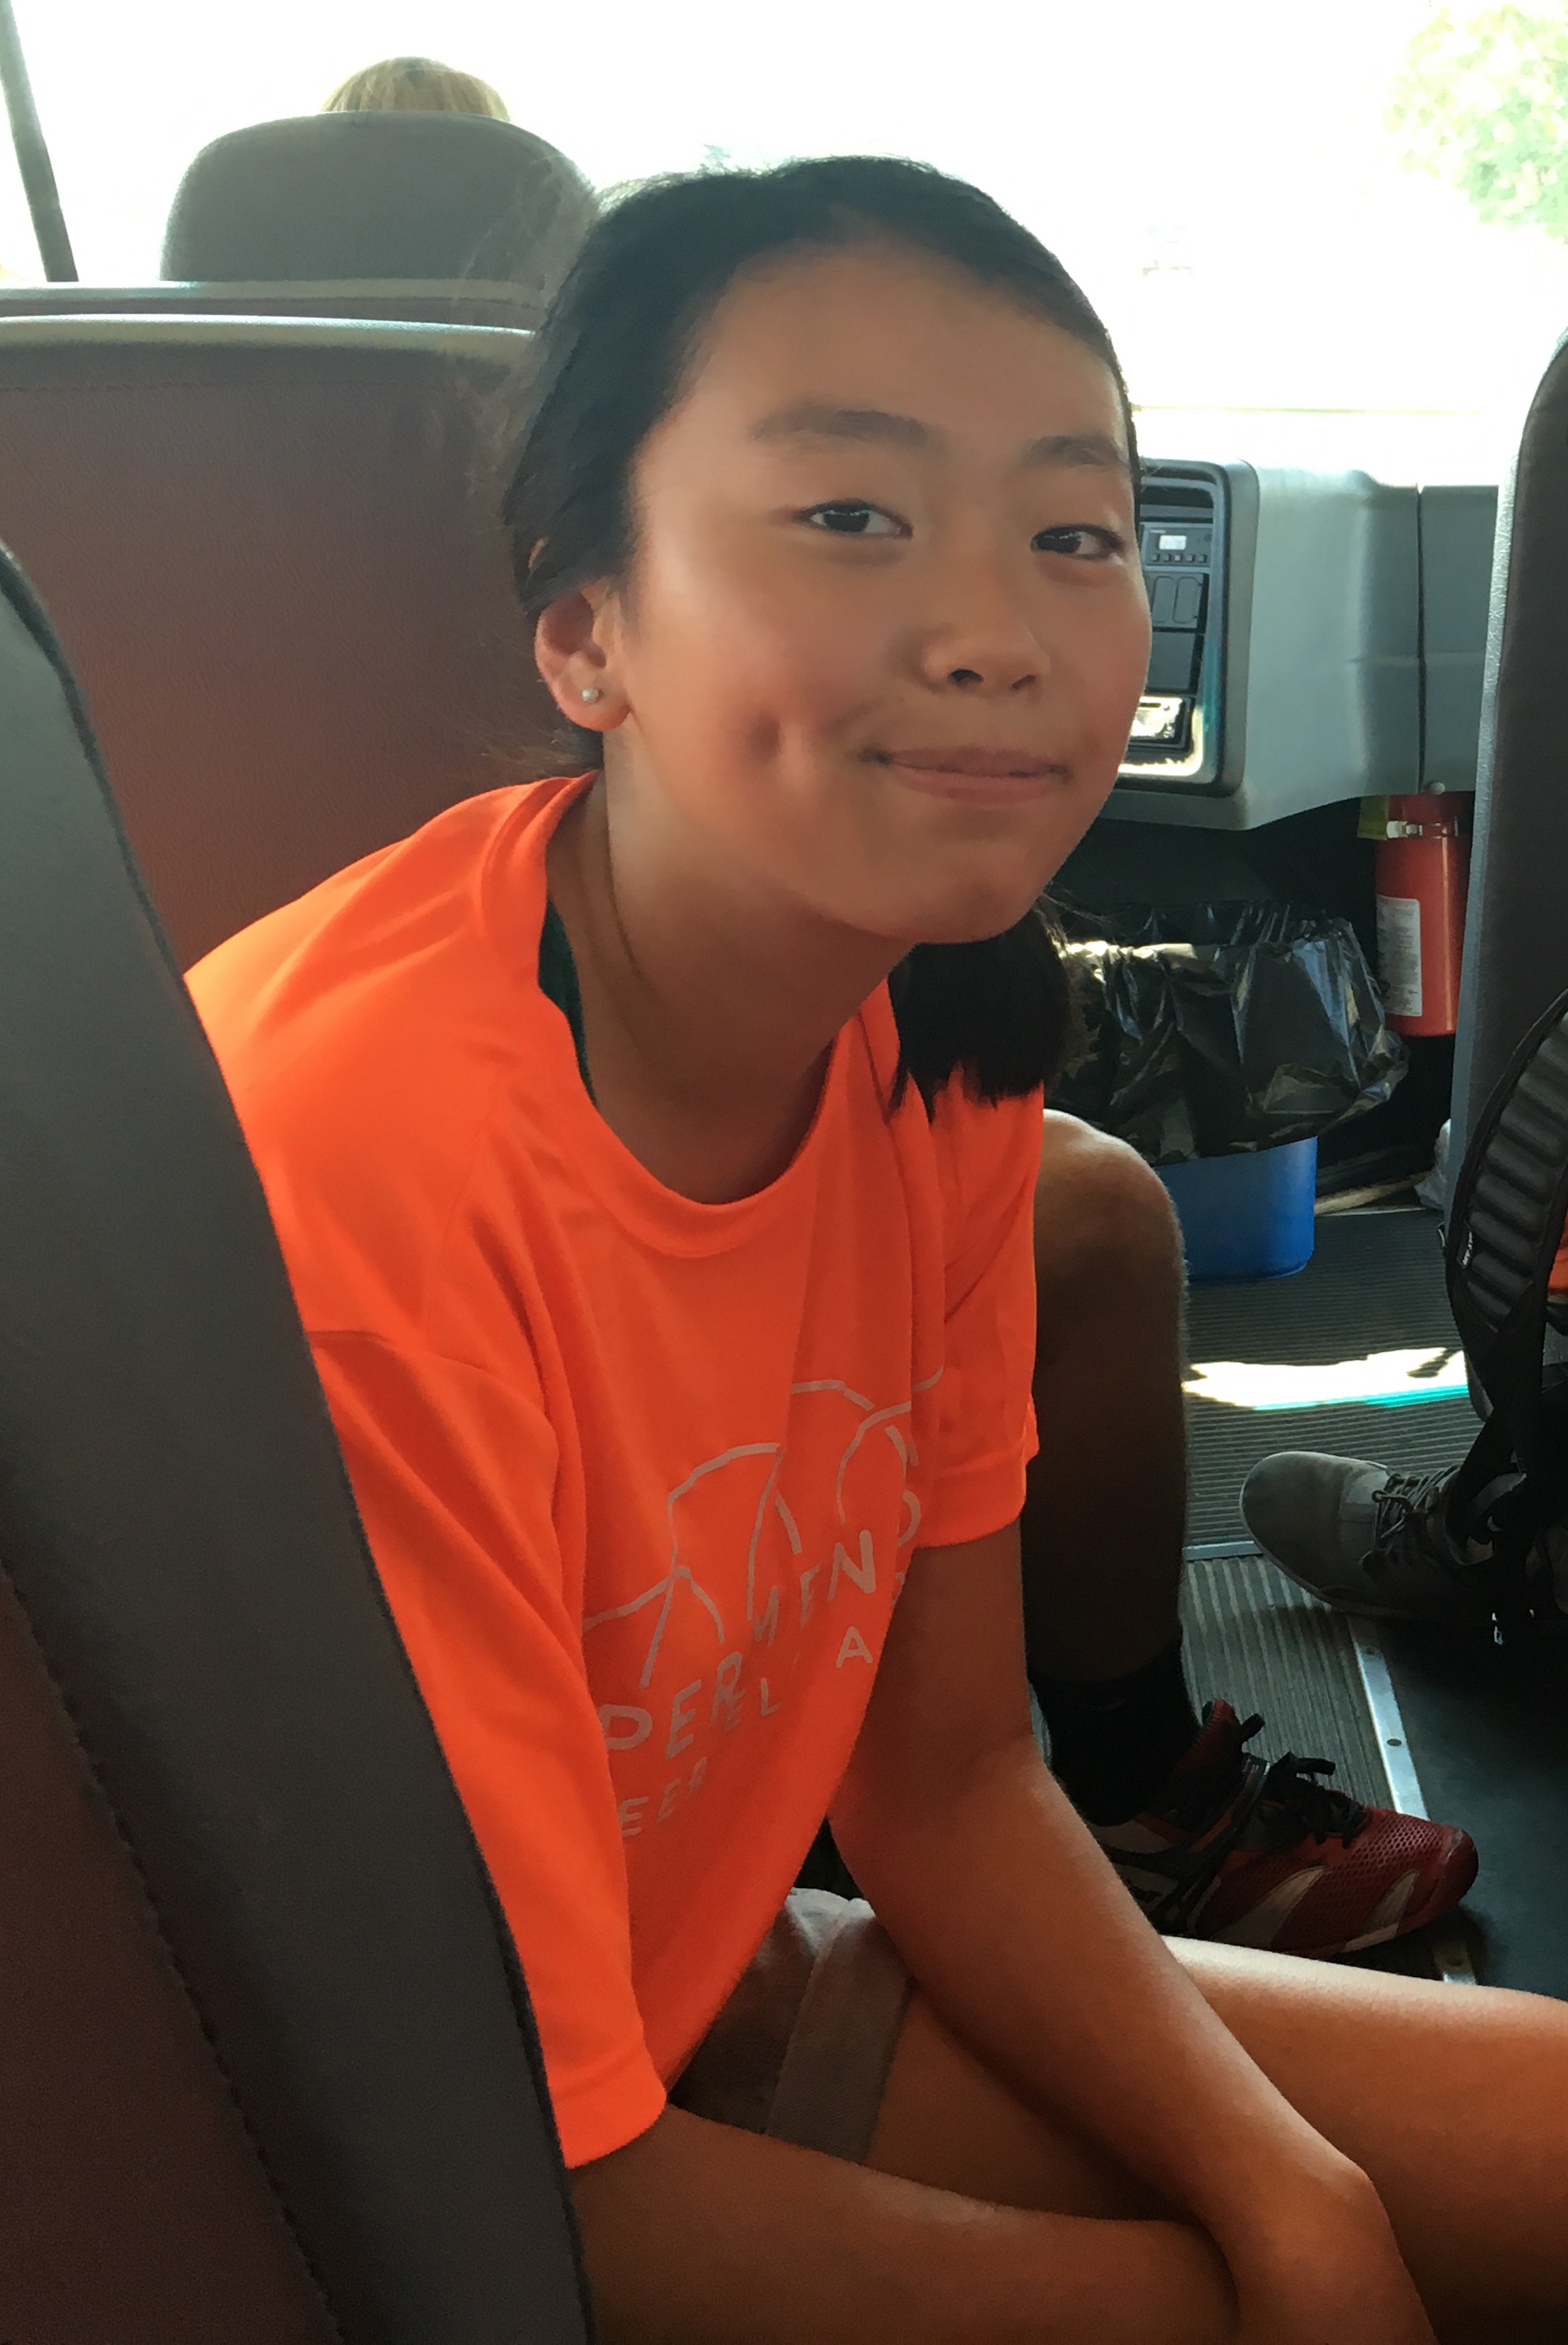 Natasha - Experimentory 2016 eighth grade student